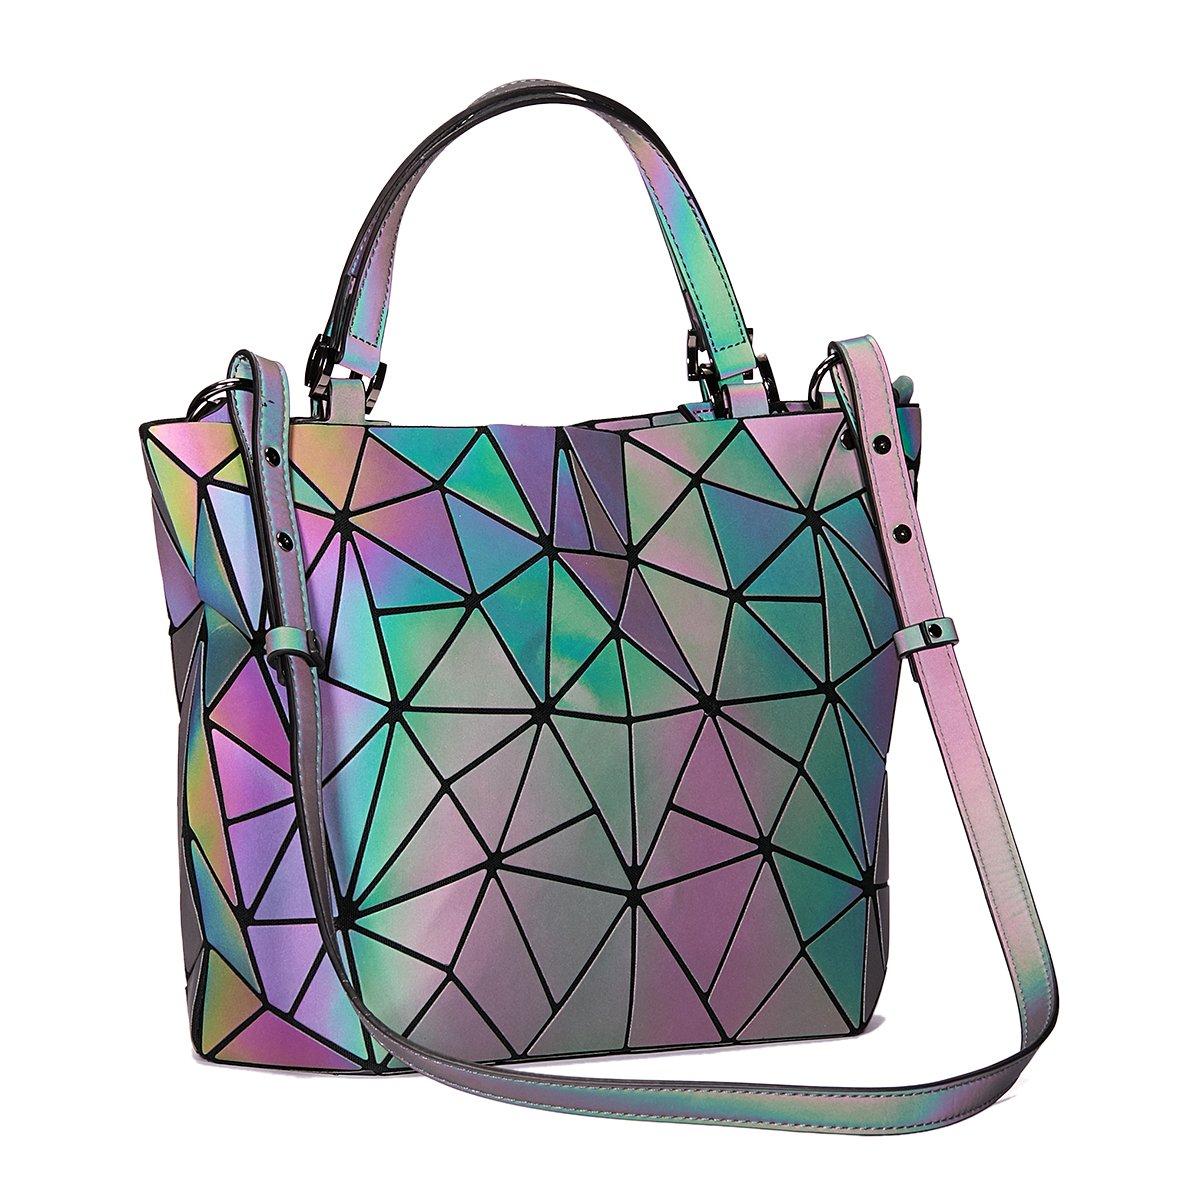 Harlermoon Geometric Luminous Holographic Purses and Handbags Flash  Reflactive Tote for Women … product image b7272fc7586